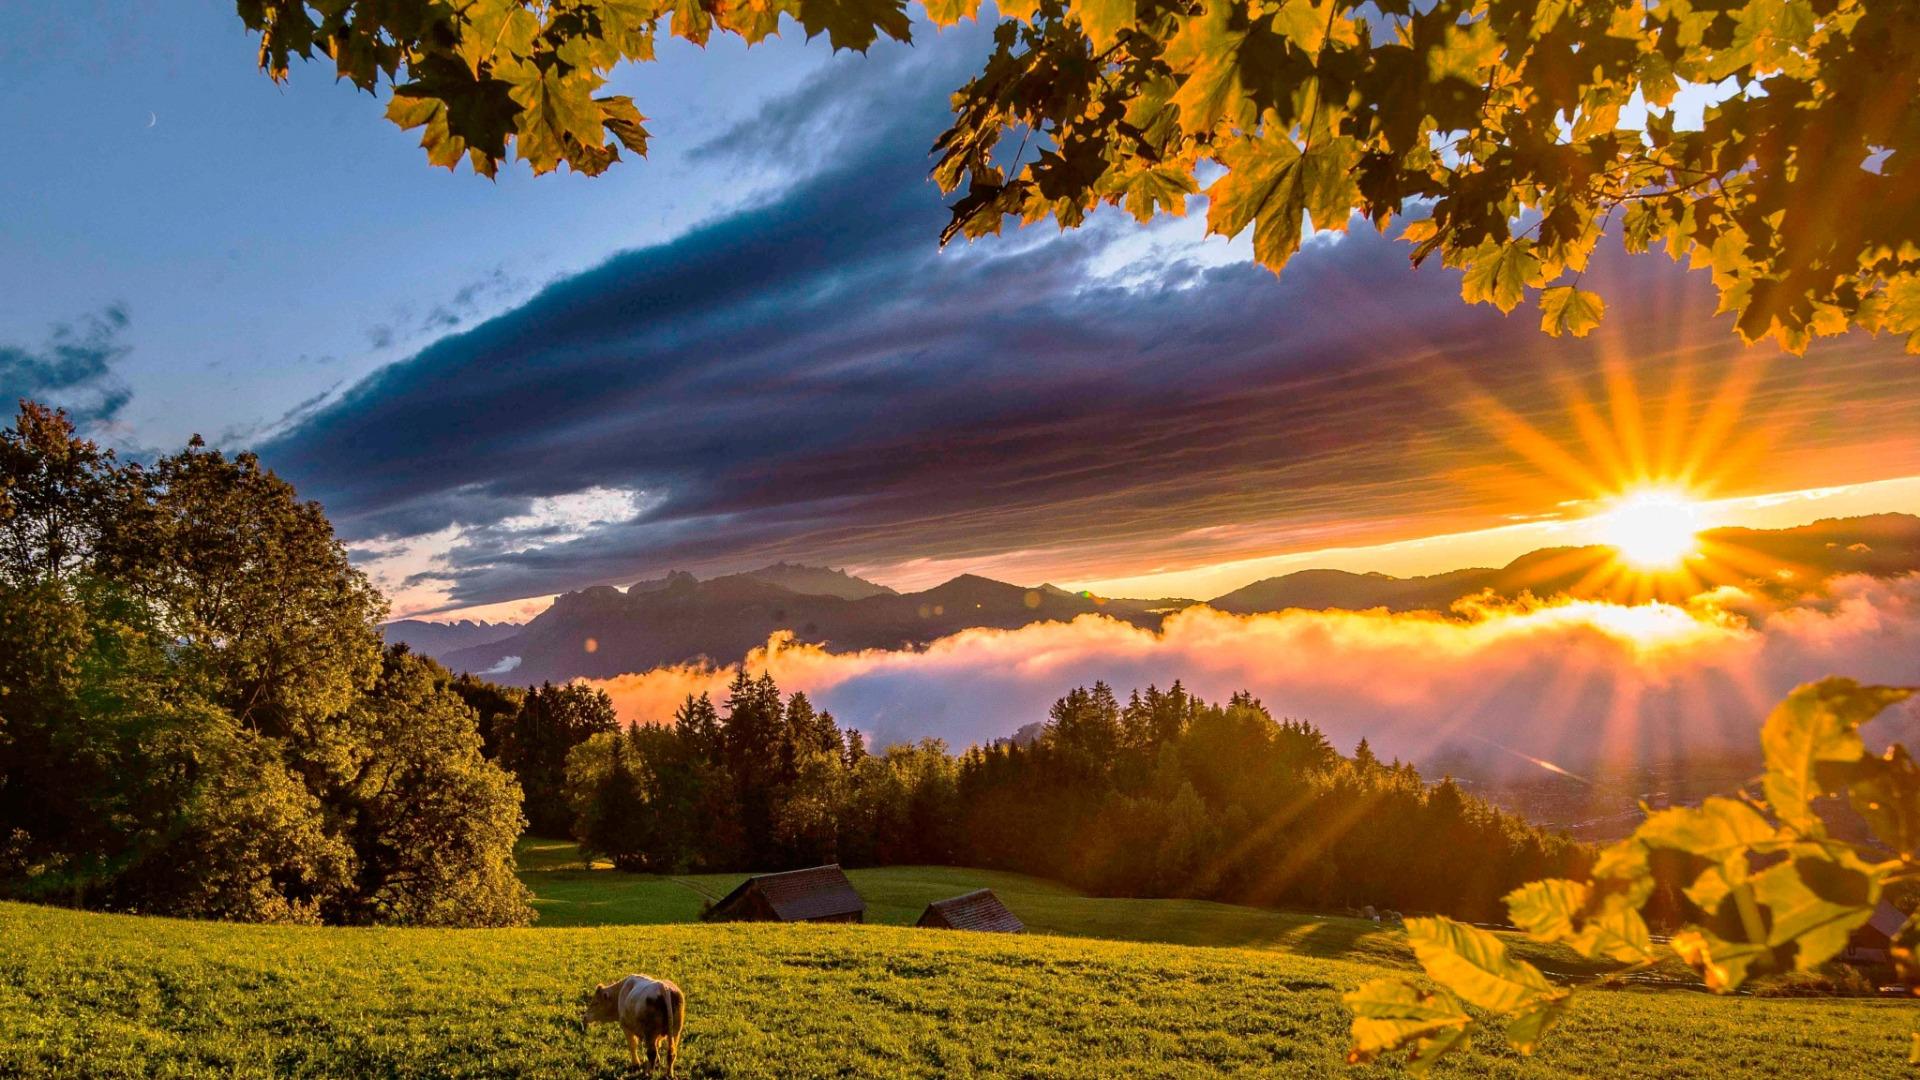 картинка пейзаж солнце испанки